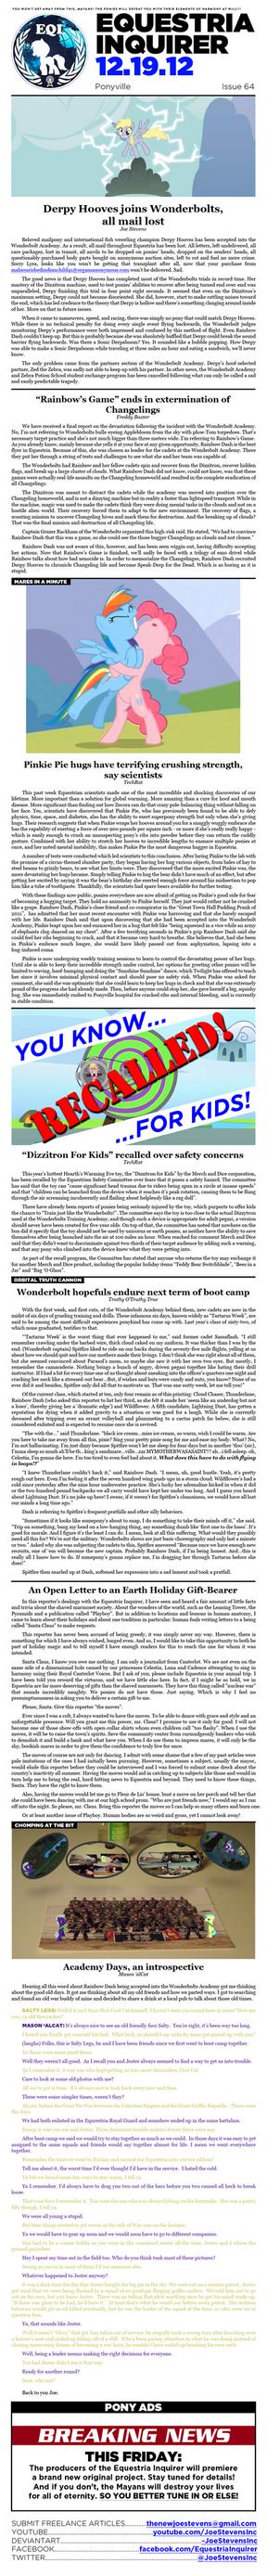 Equestria Inquirer 64 by JoeStevensInc